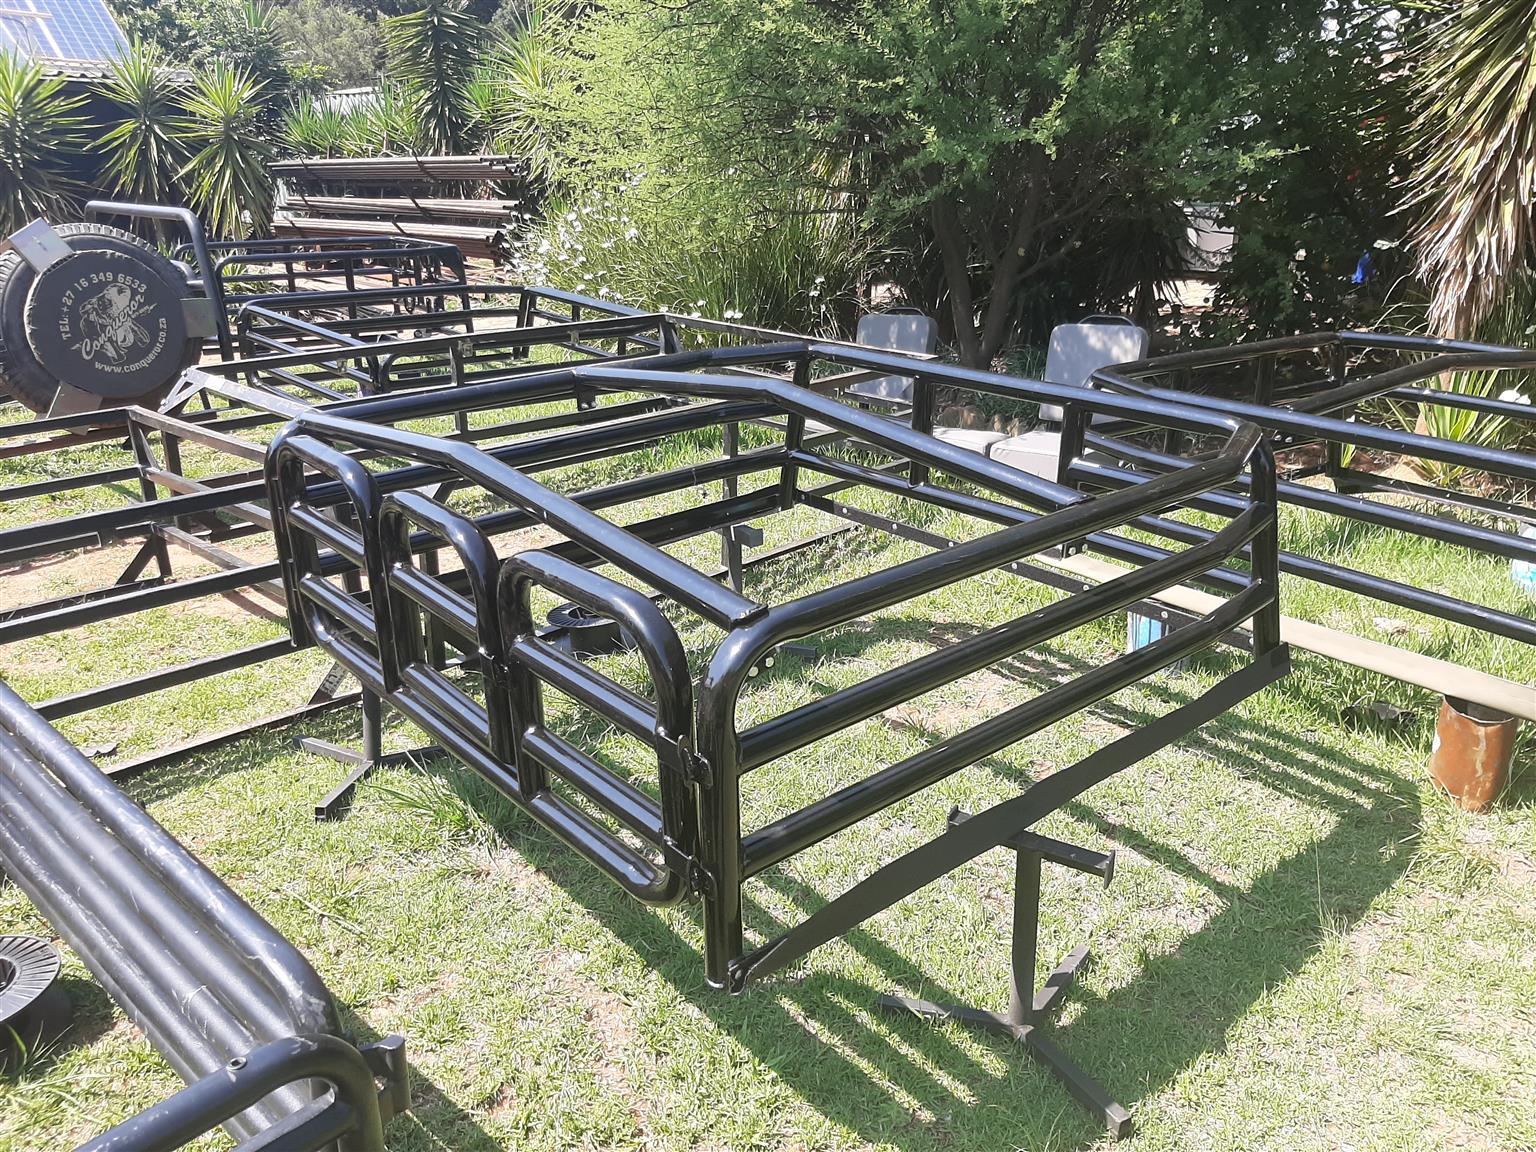 Isuzu DC cattle rails and canvas canopy